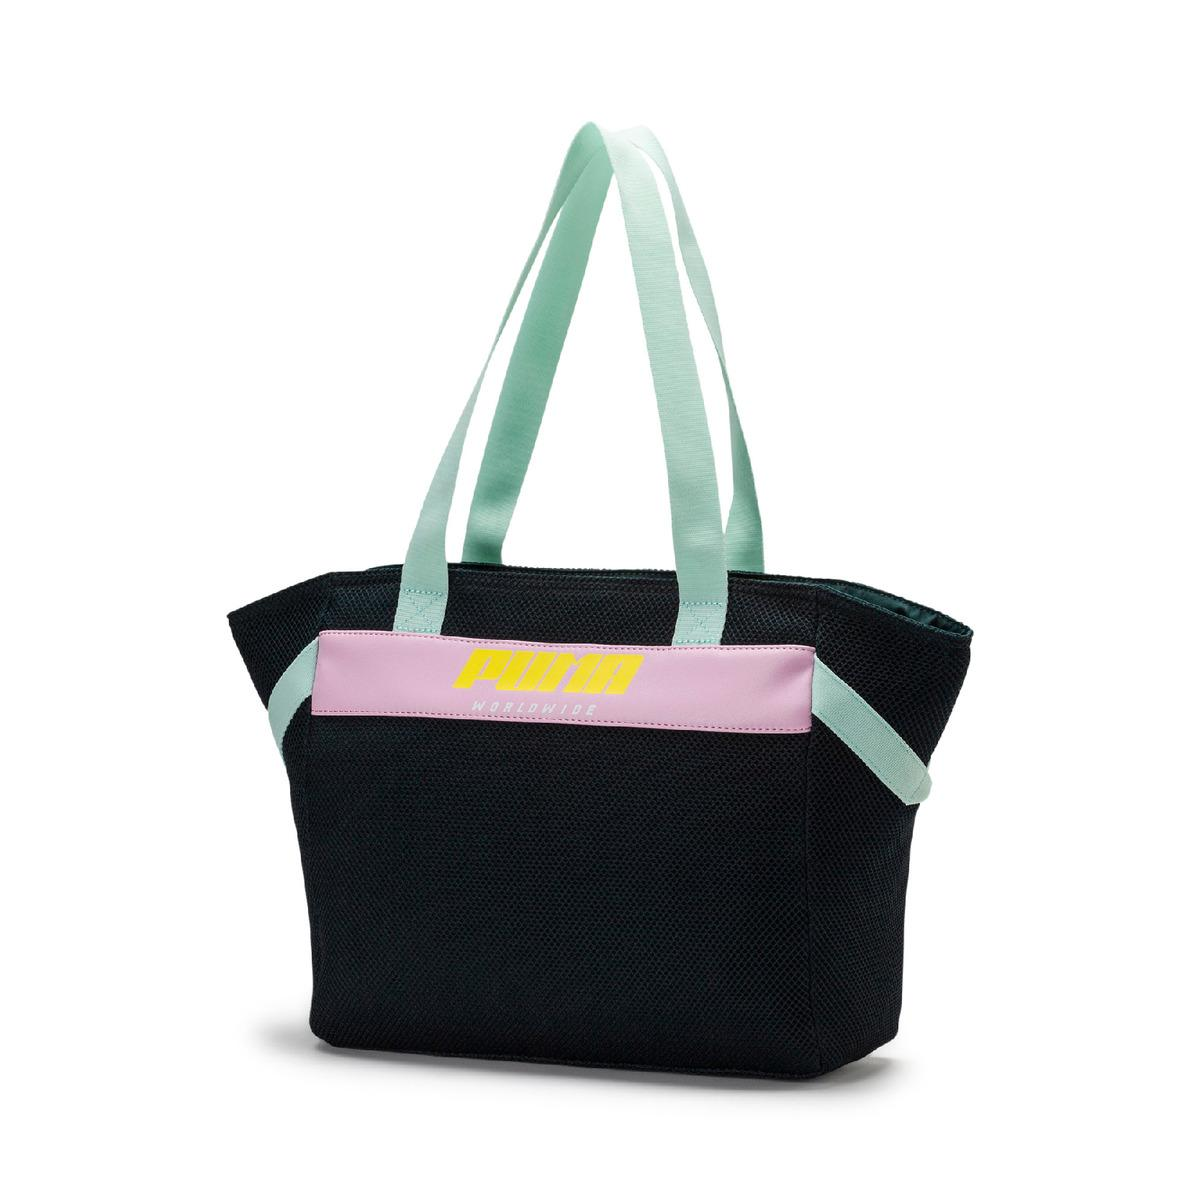 Prime Street Large Shopper Bag